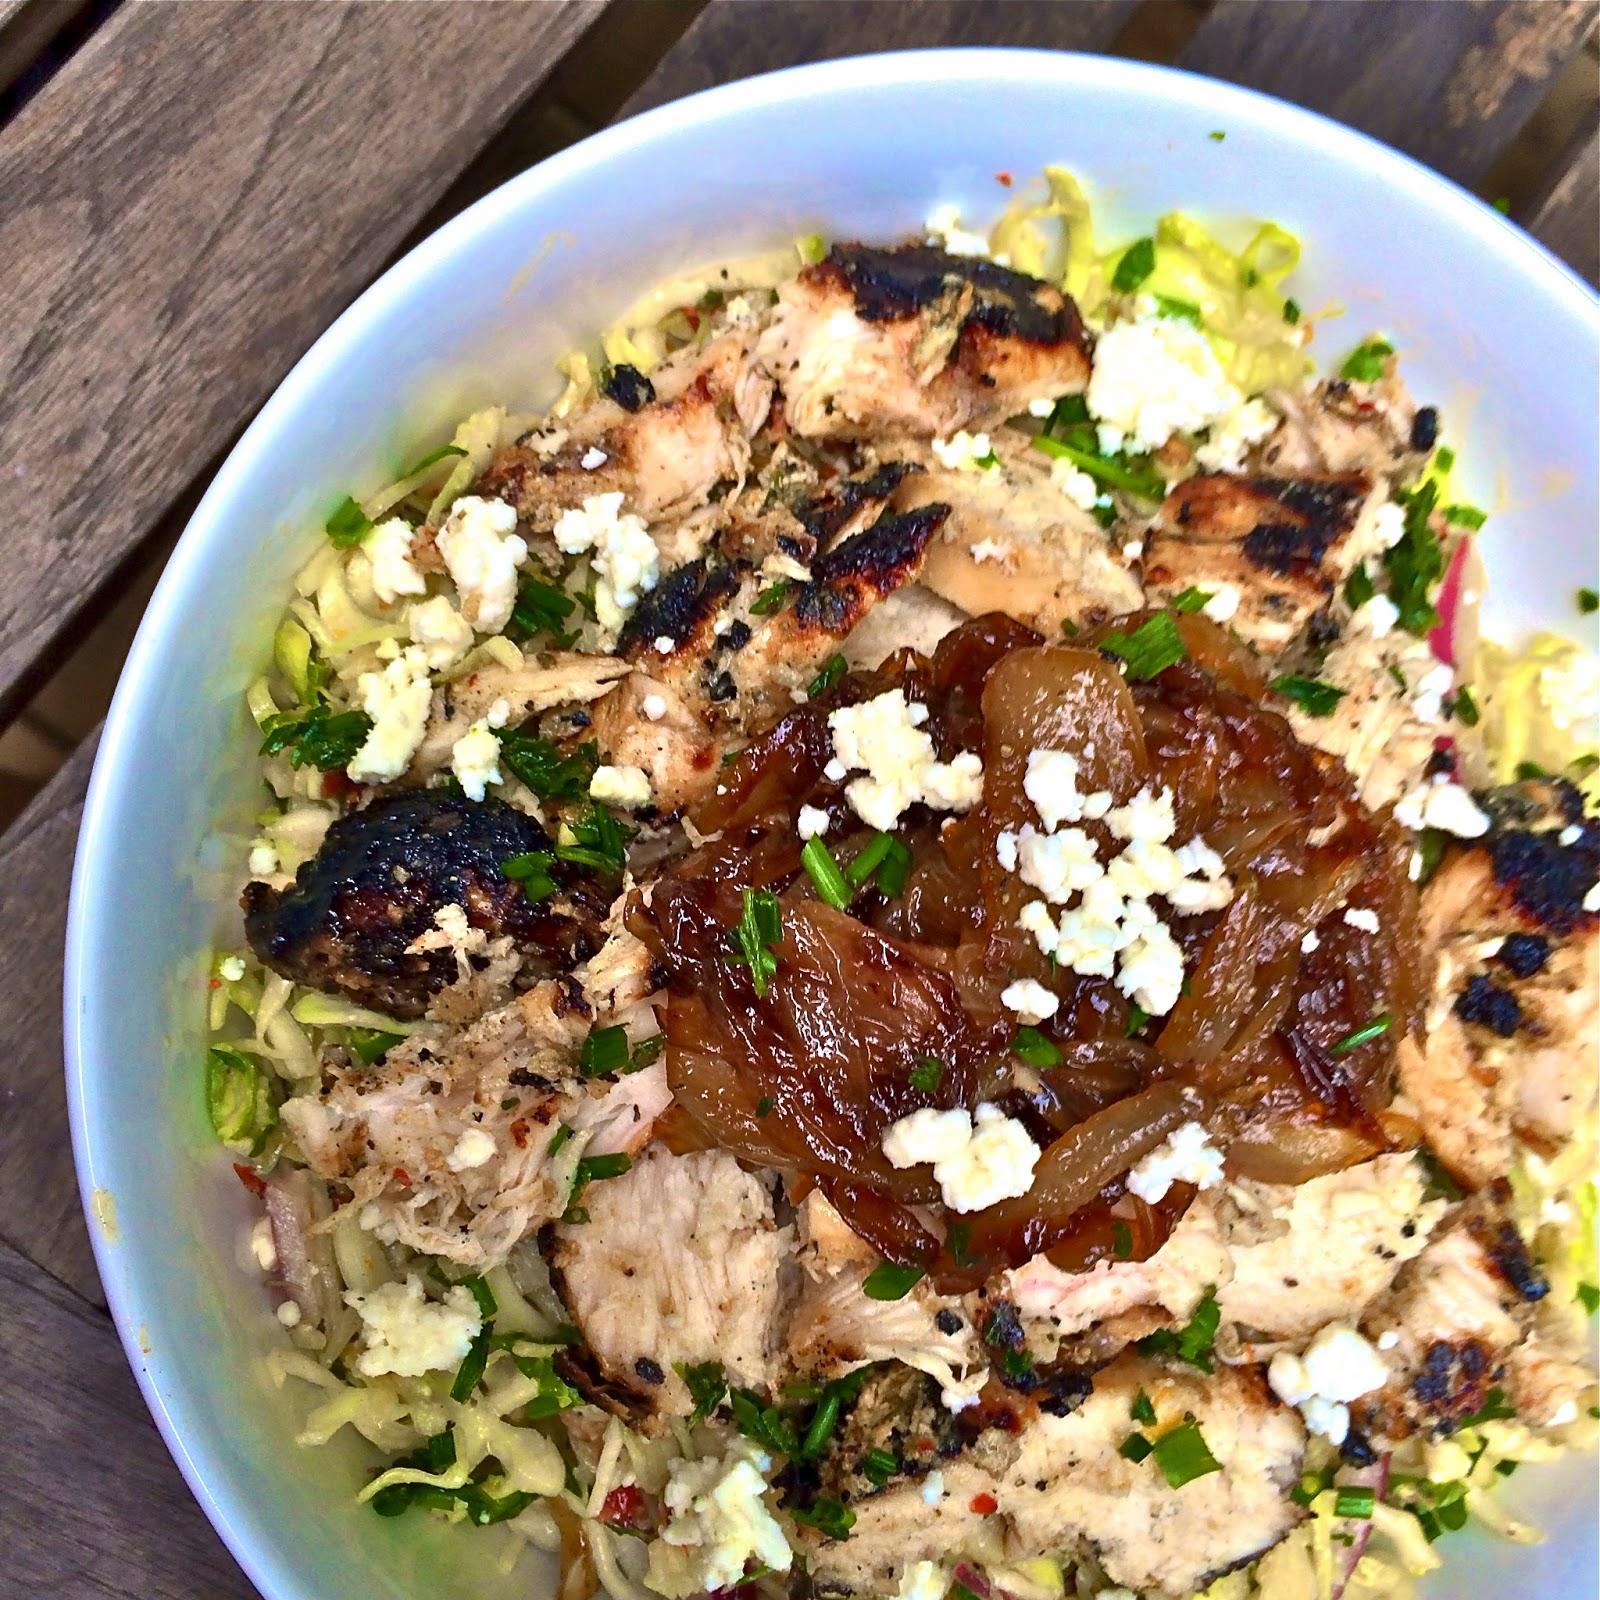 Zo S Kitchen Protein Power Plate haute + heirloom: copycat recipe: zoe's kitchen protein power